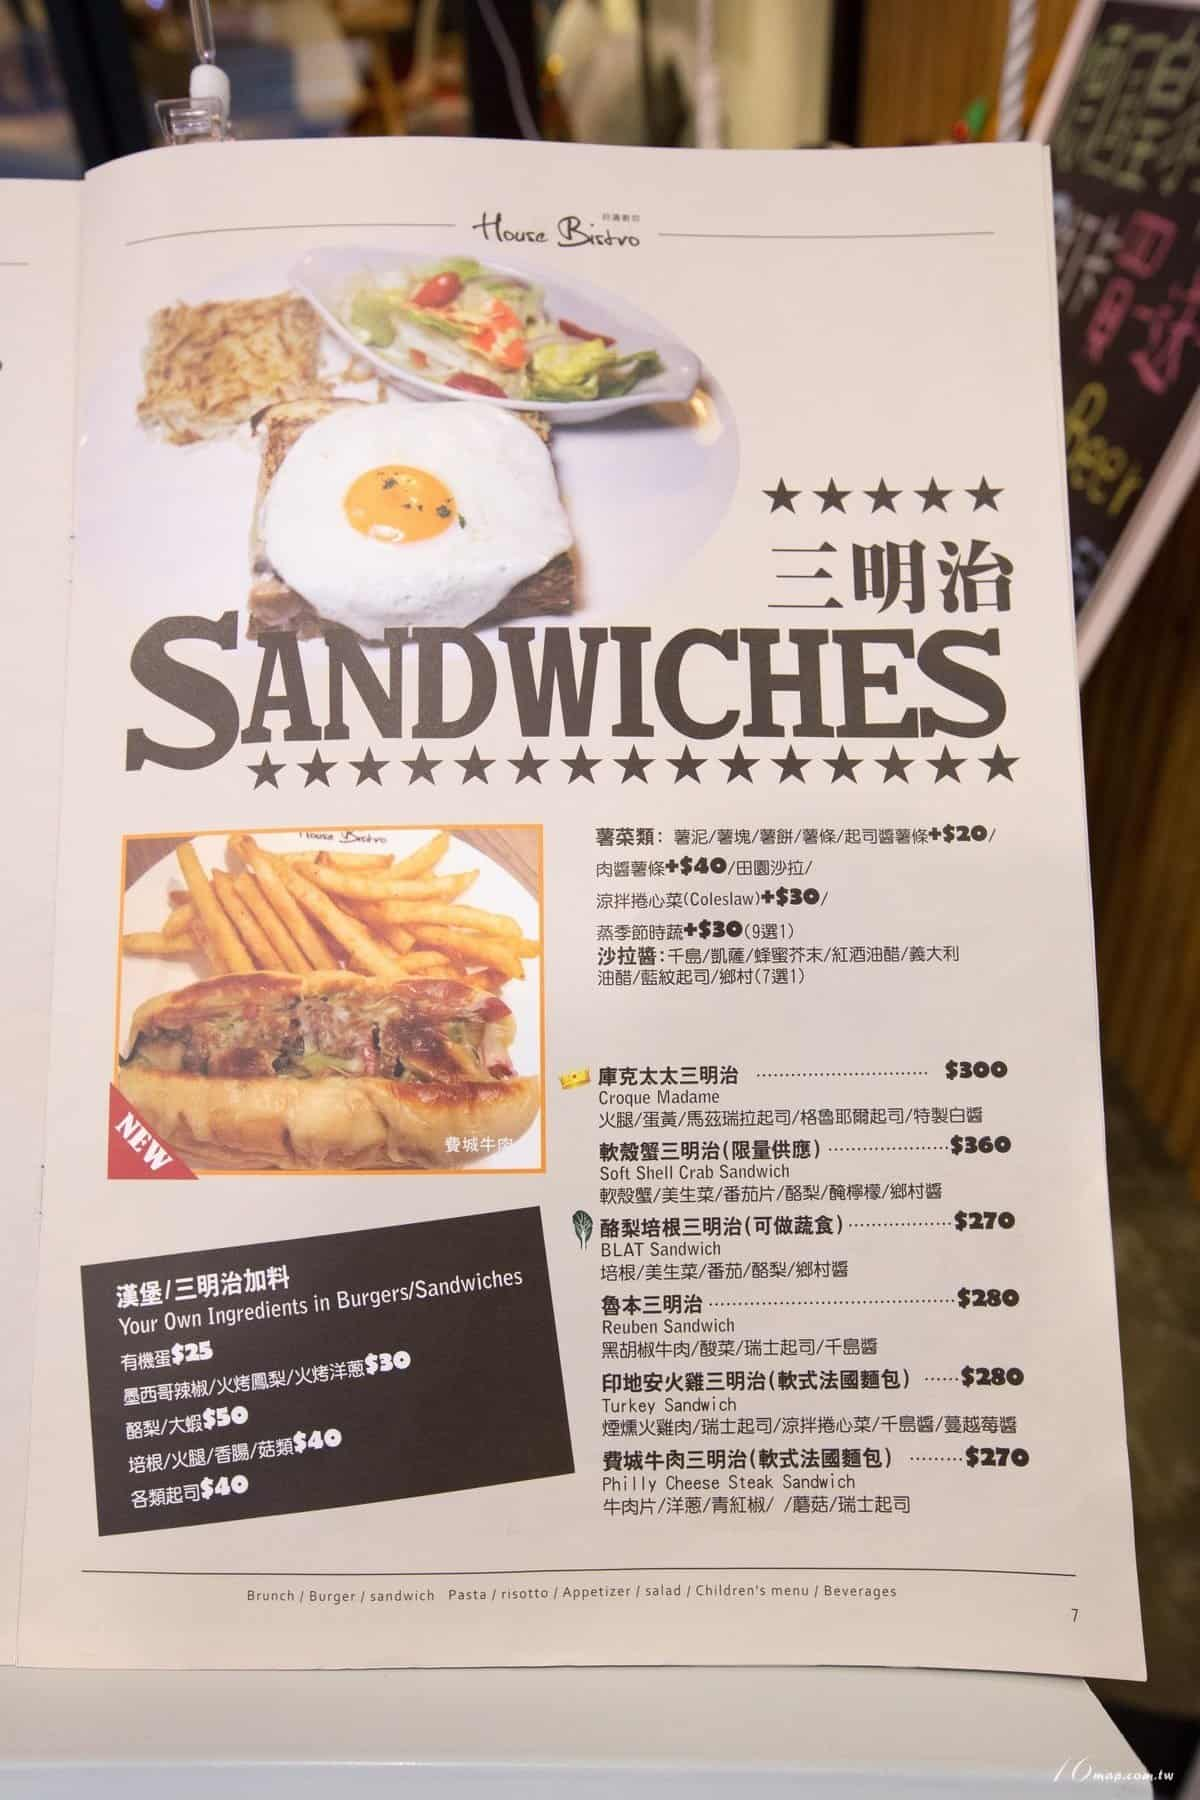 Housebistro-menu-6